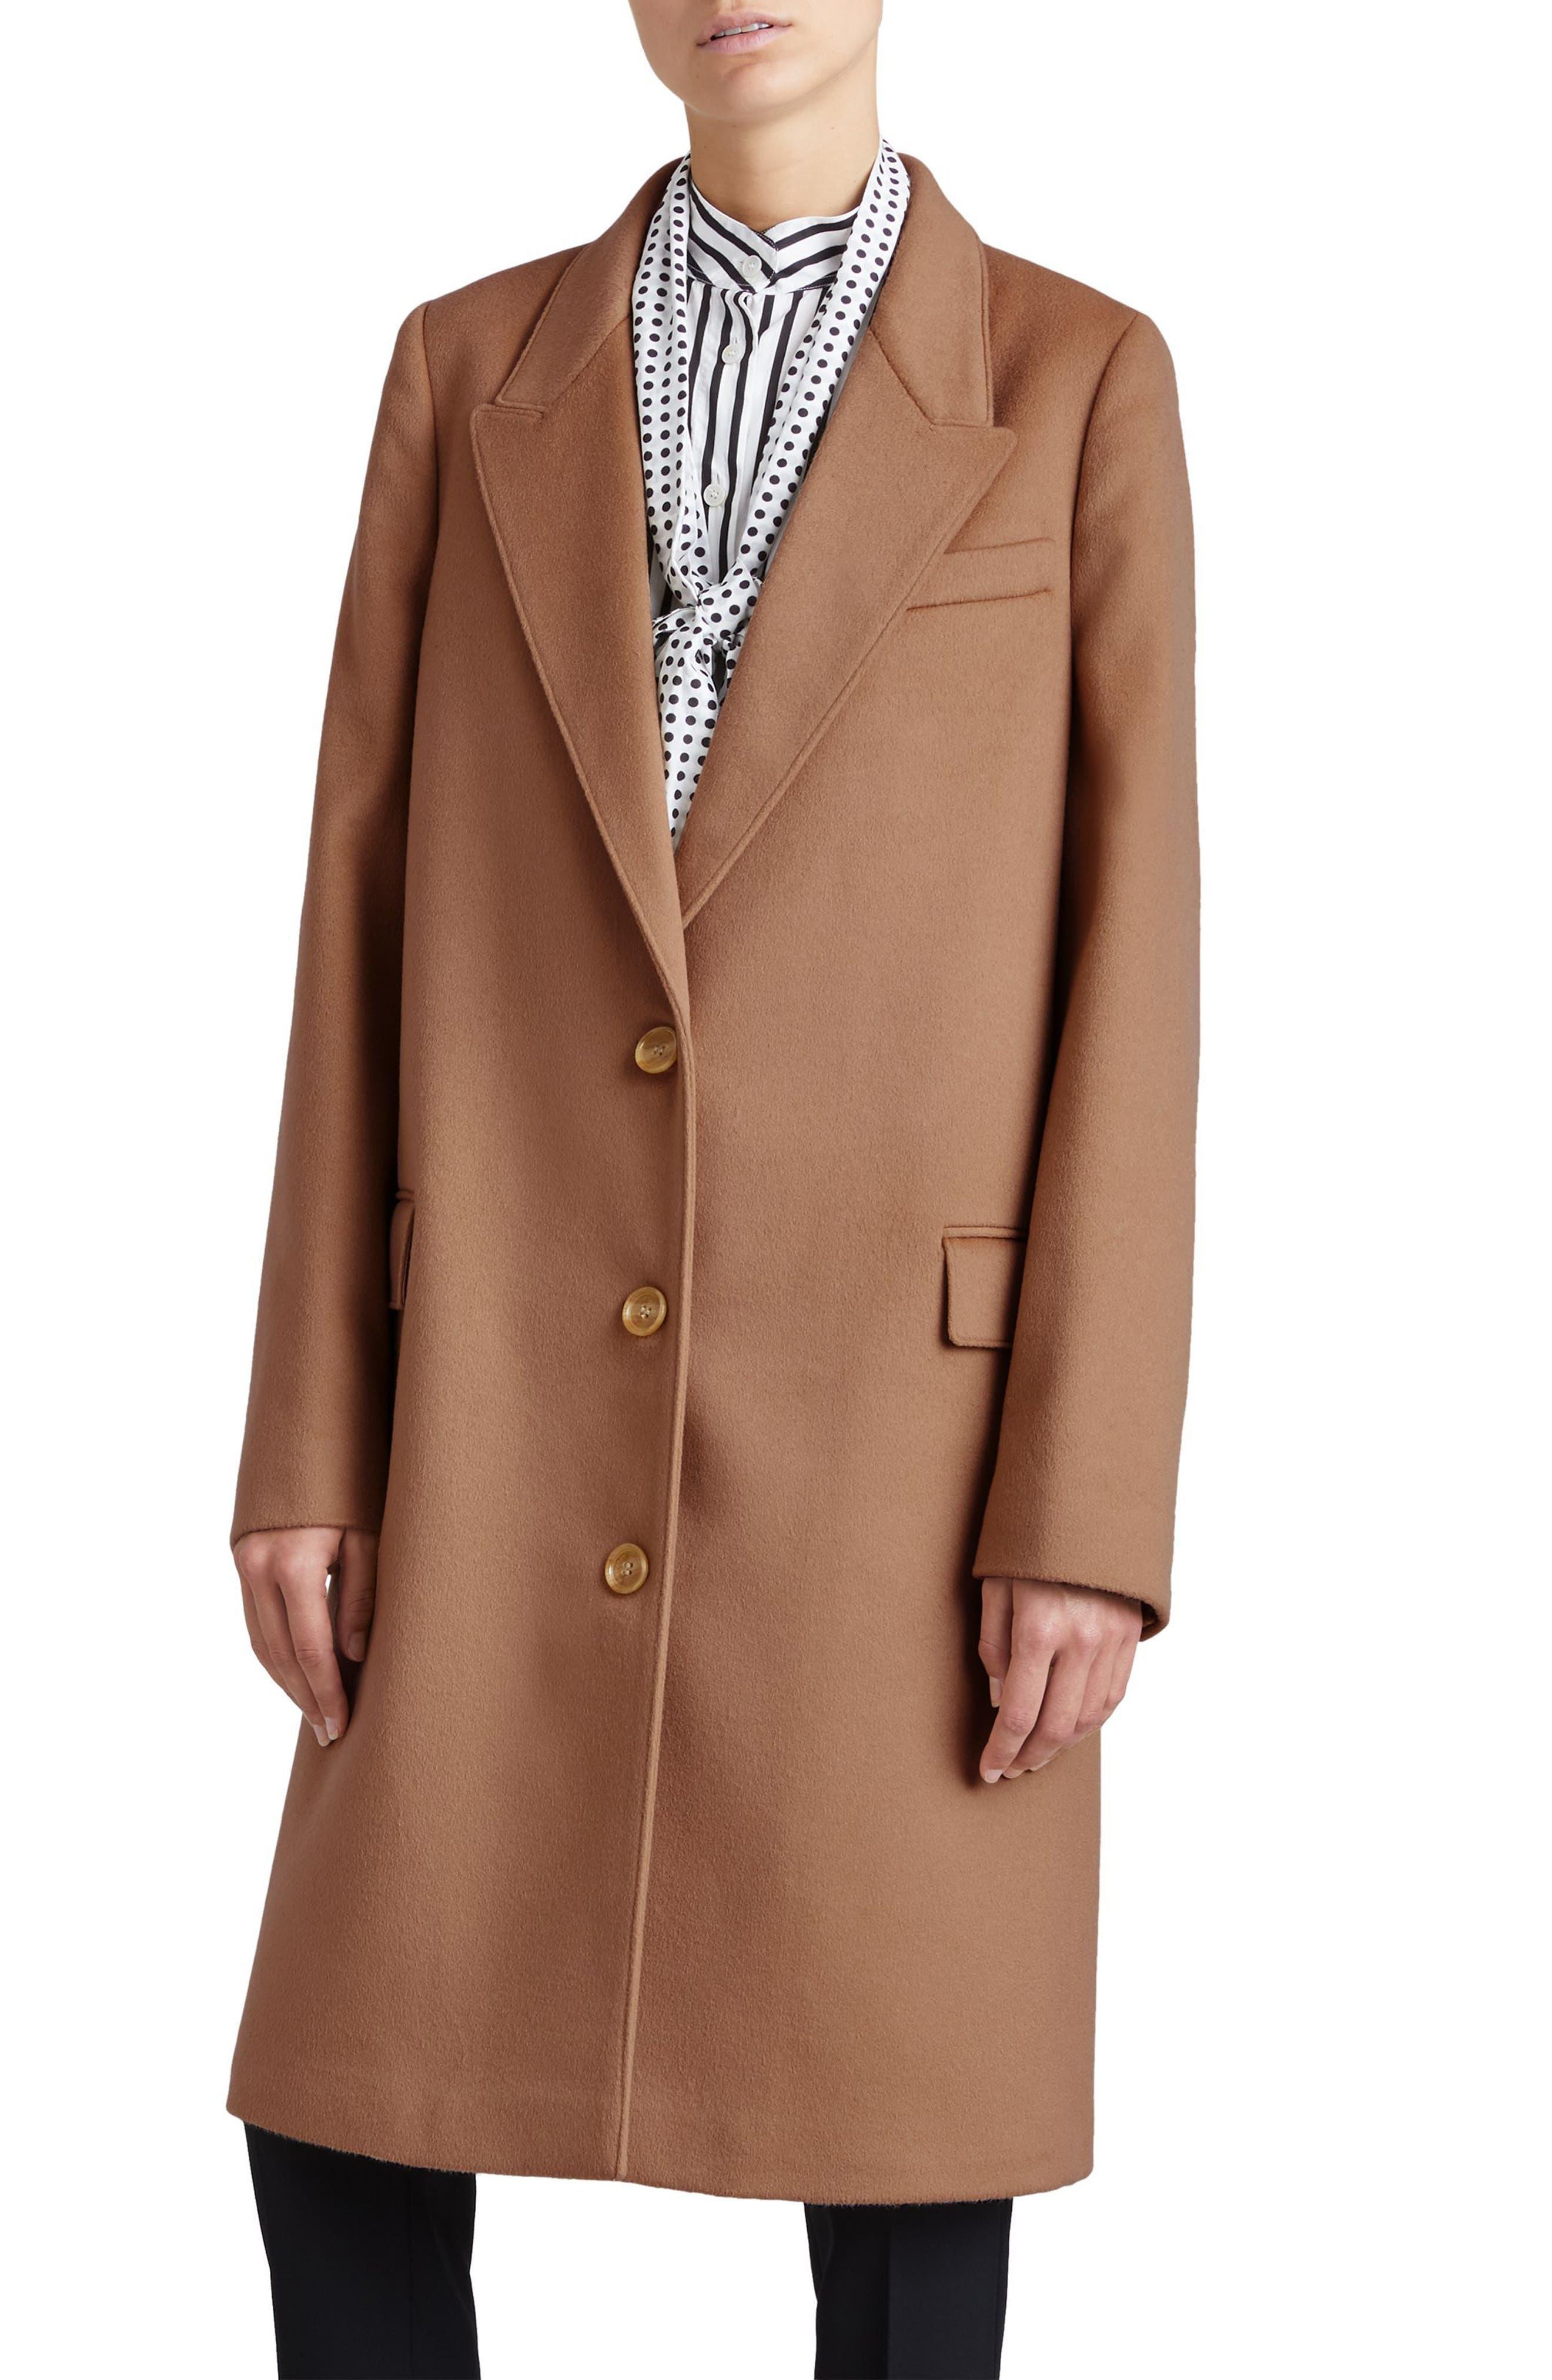 Main Image - Burberry Fellhurst Wool & Cashmere Coat